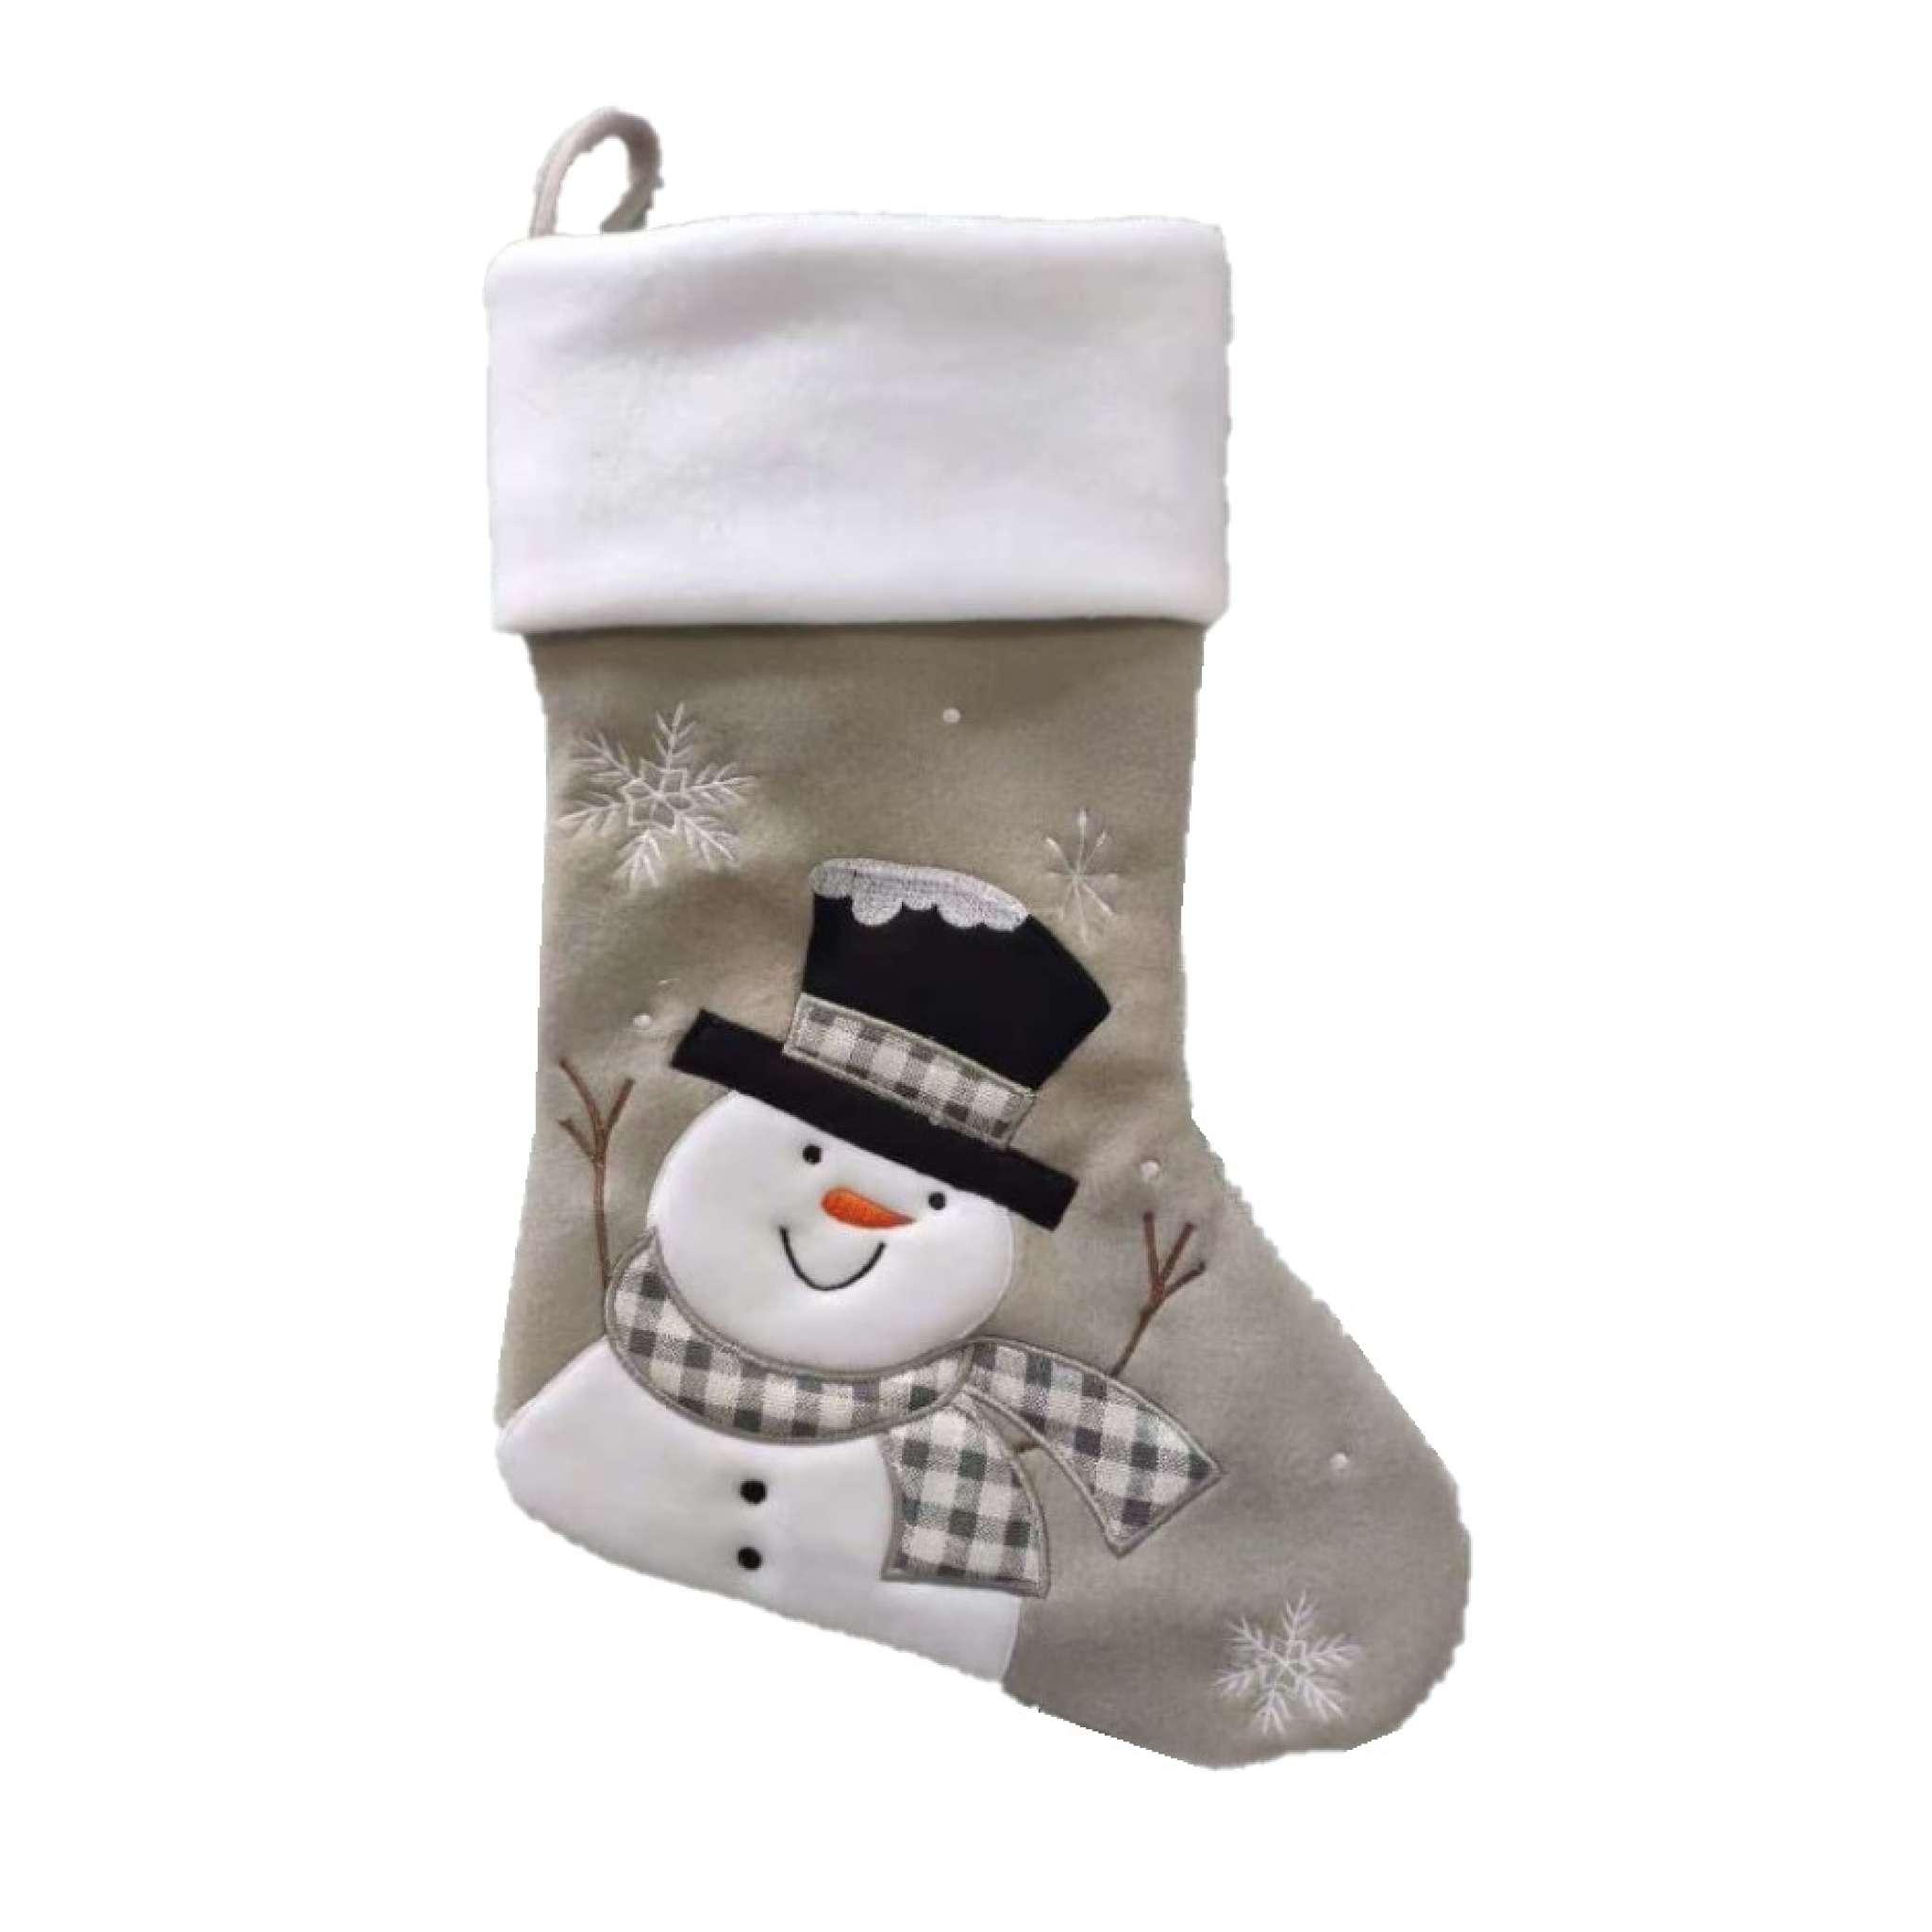 Julestrømpe Premium, Snømann, Hvit